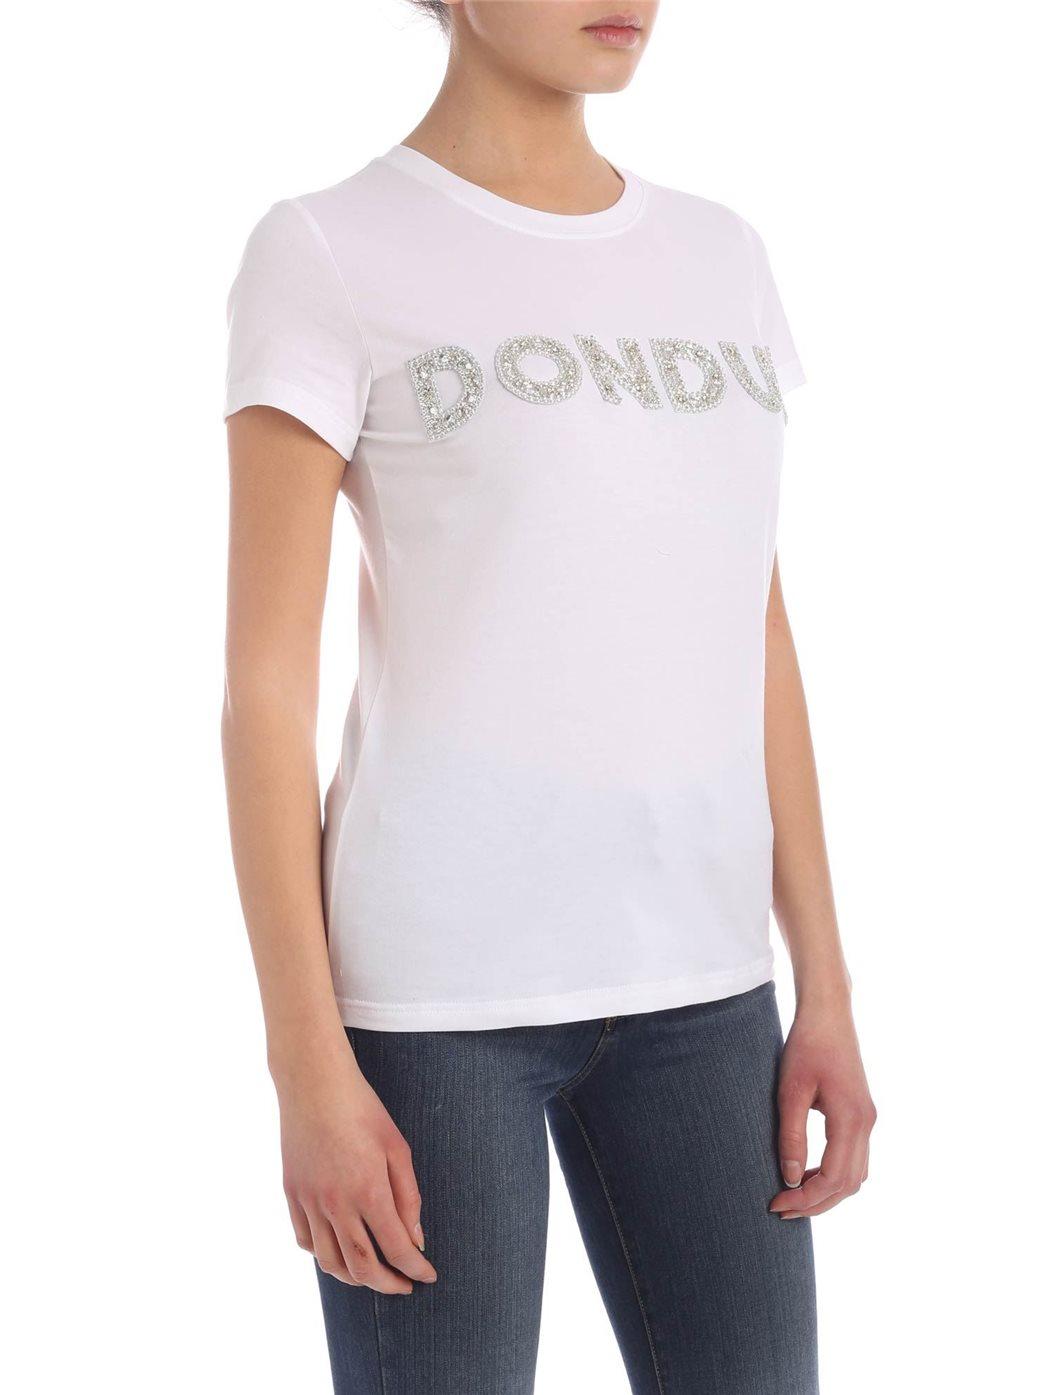 DONDUP S007 DD000 T-SHIRT